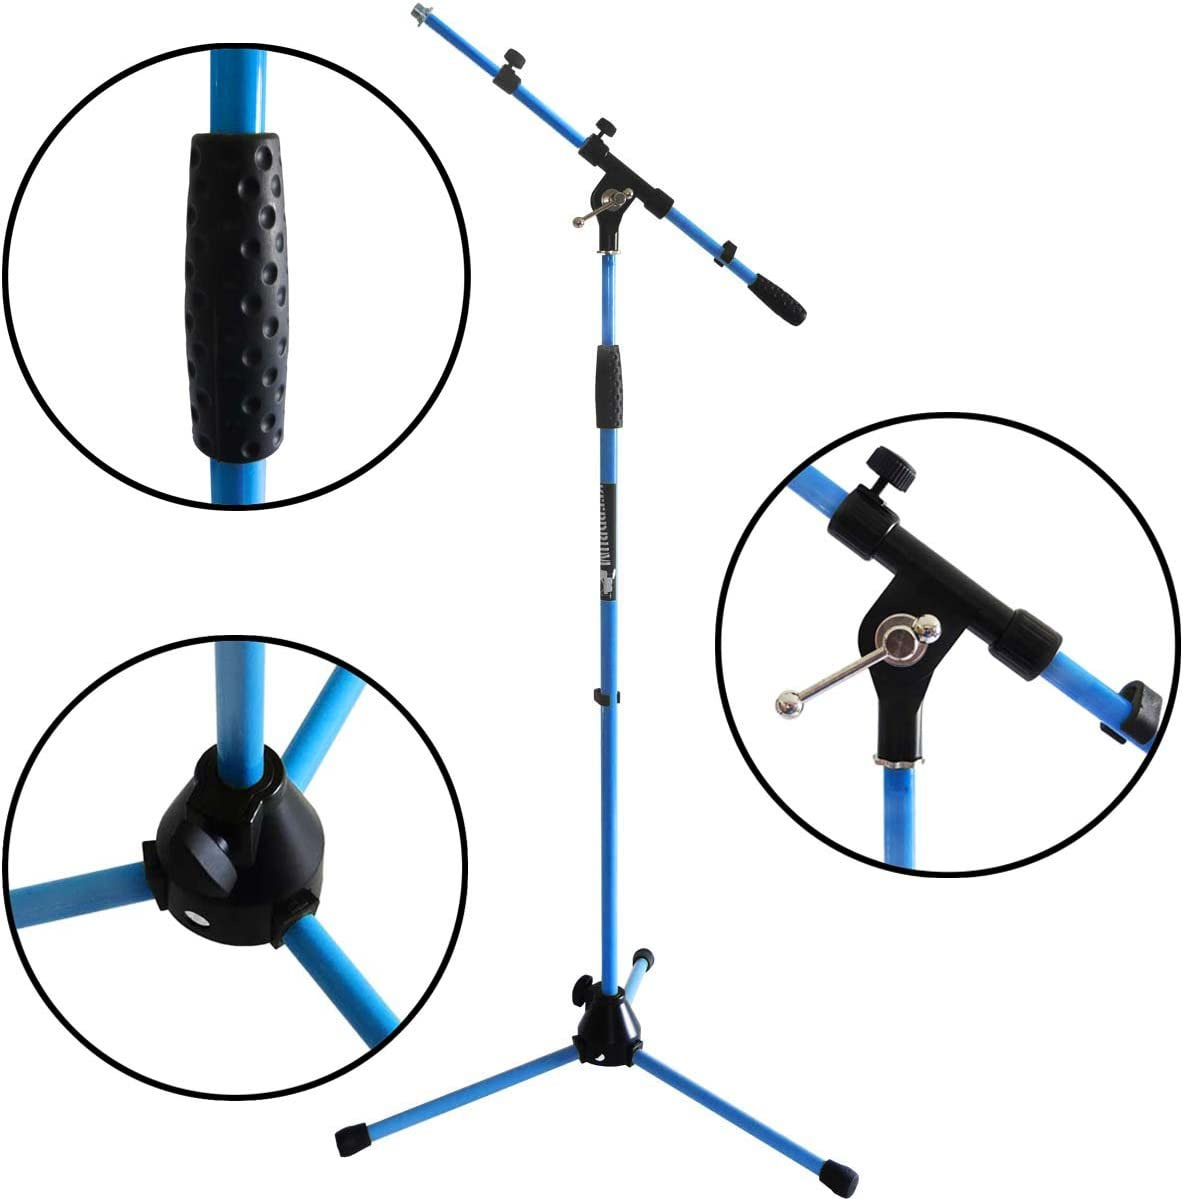 universal Mikrofonklemme keepdrum MS106 GR Gr/ün Mikrofonst/änder Mikrofonstativ mit Galgen u Metall-Sockel